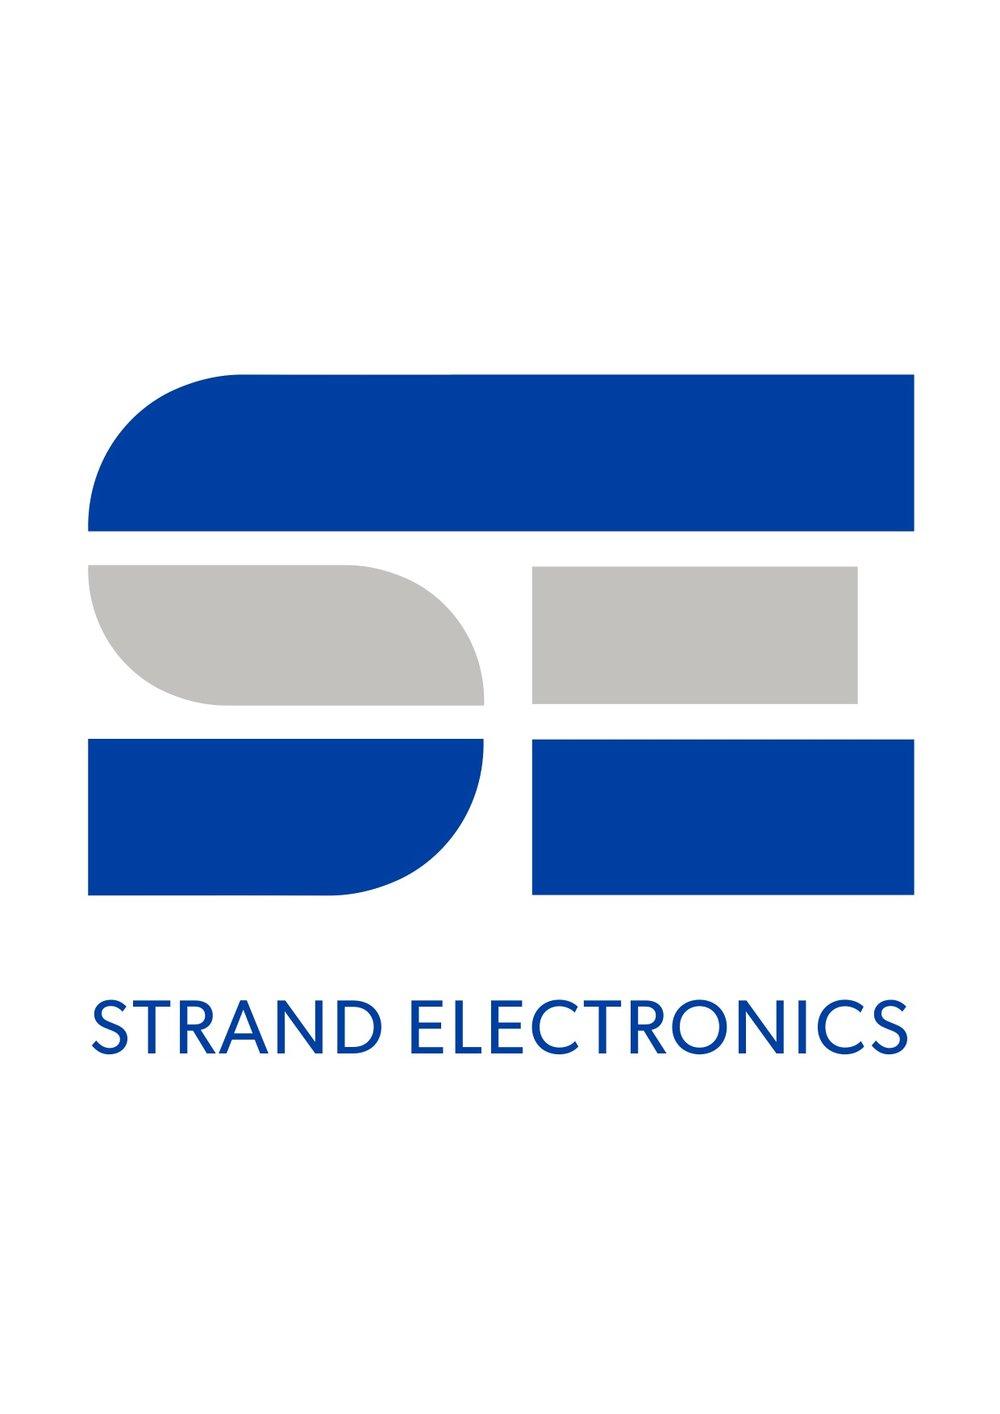 StrandElectronics_Logo[1].jpg